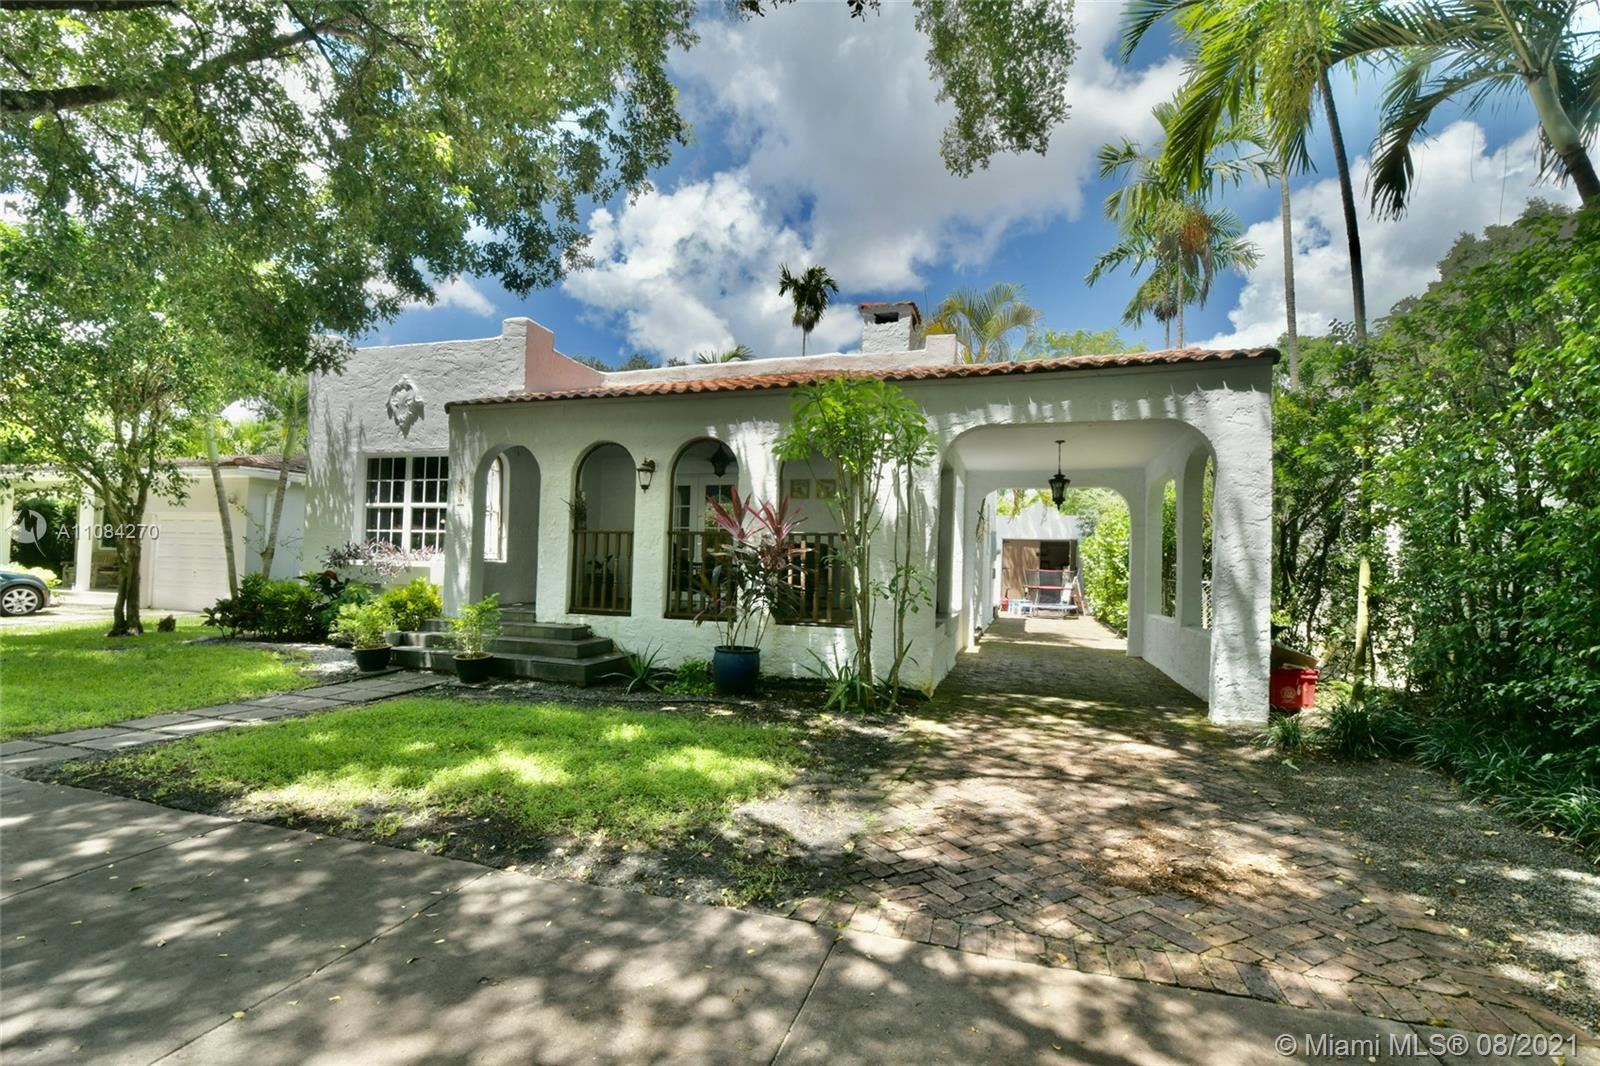 830 Pizarro St, Coral Gables, FL 33134 - #: A11084270